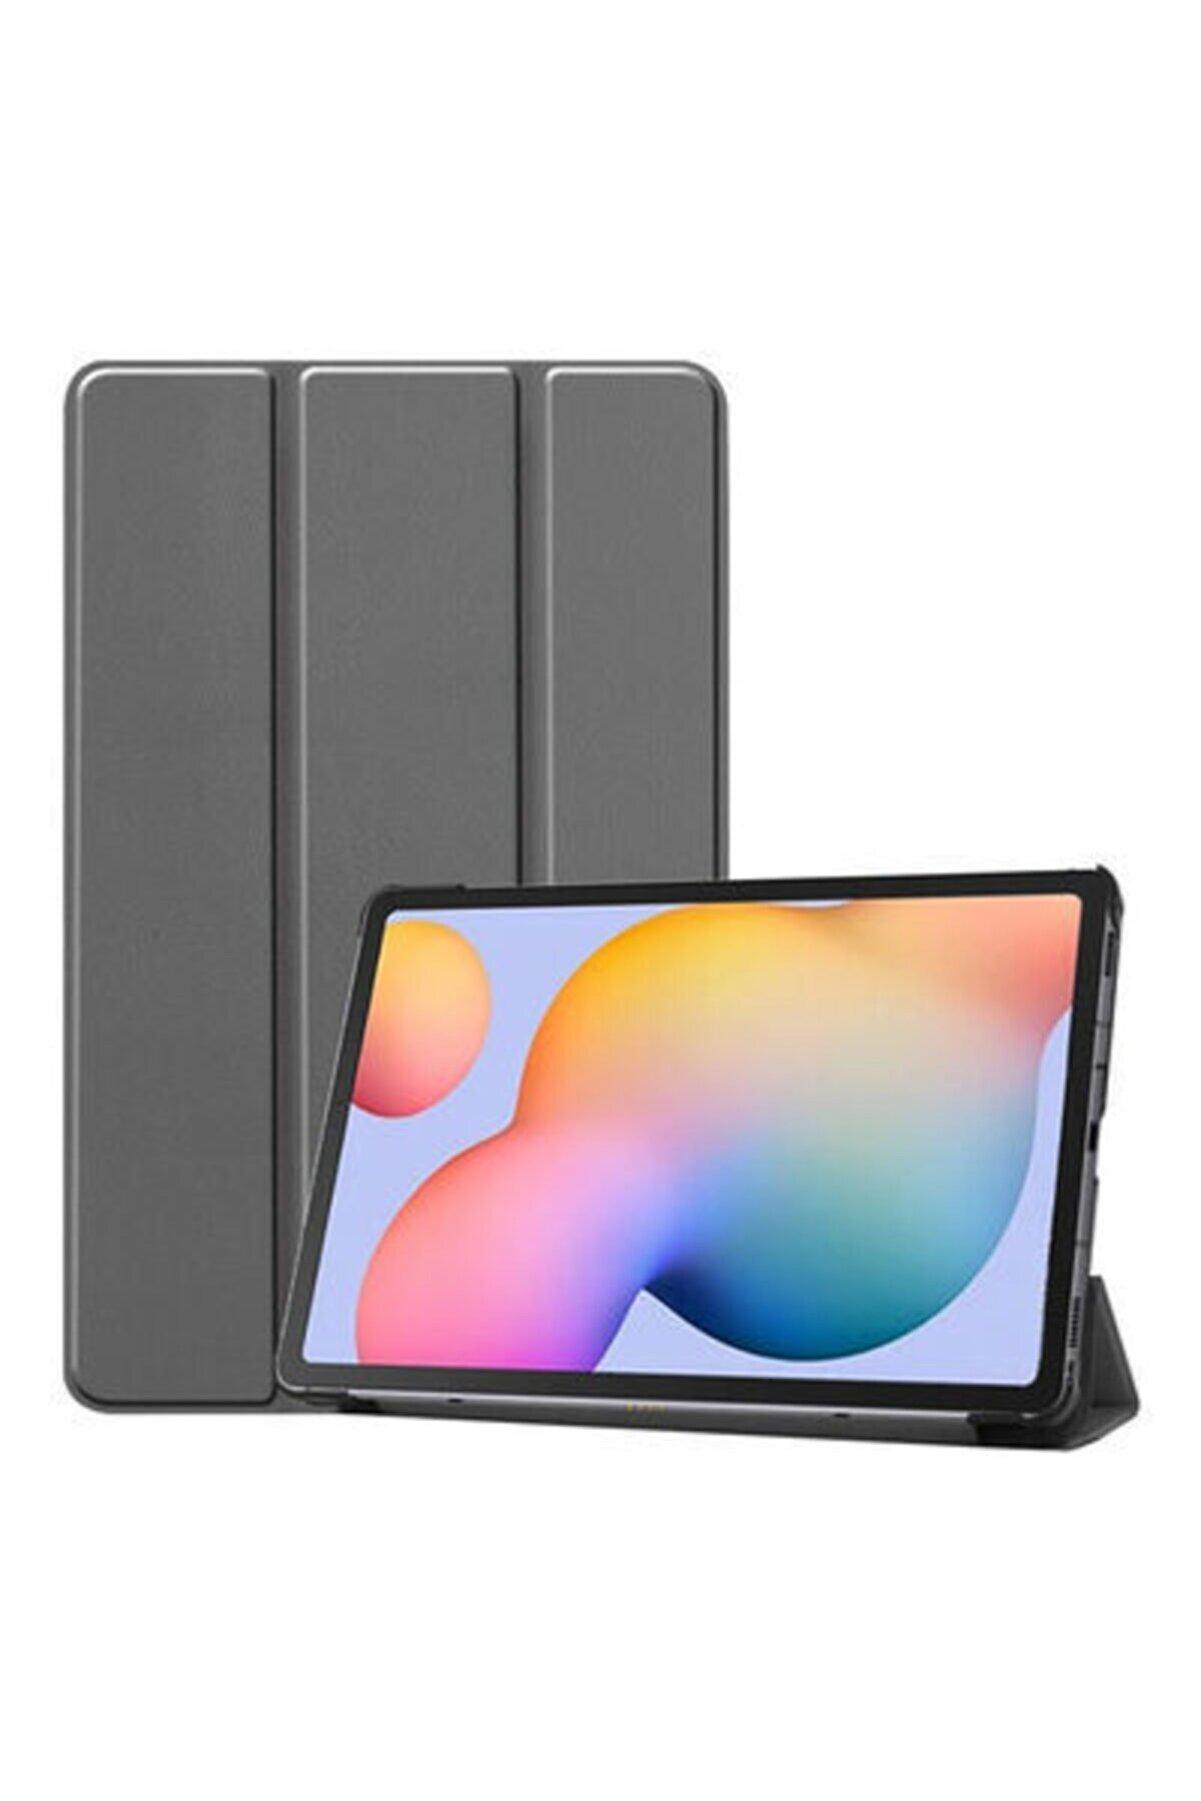 Zore Huawei Mate Pad Pro 10.8 Smart Cover Standlı 1-1 Kılıf